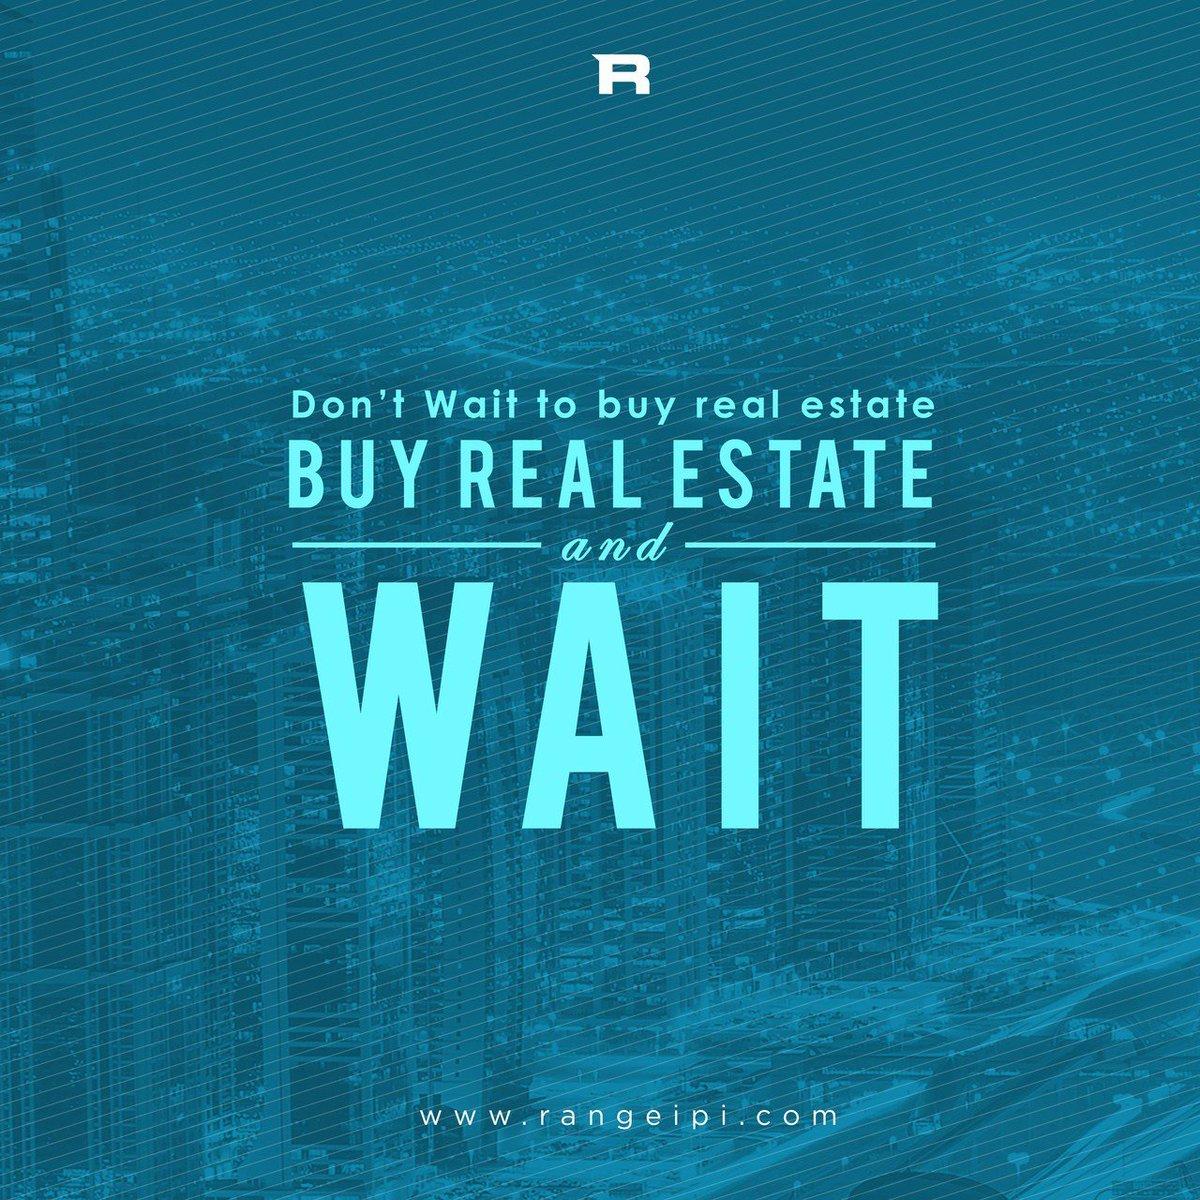 Patience is a virtue that always pays off! #range #rangeinternational #rangeipi #quote #realestate #dubairealestate #dubaiproperties #emaar<br>http://pic.twitter.com/ng44cnJrcX